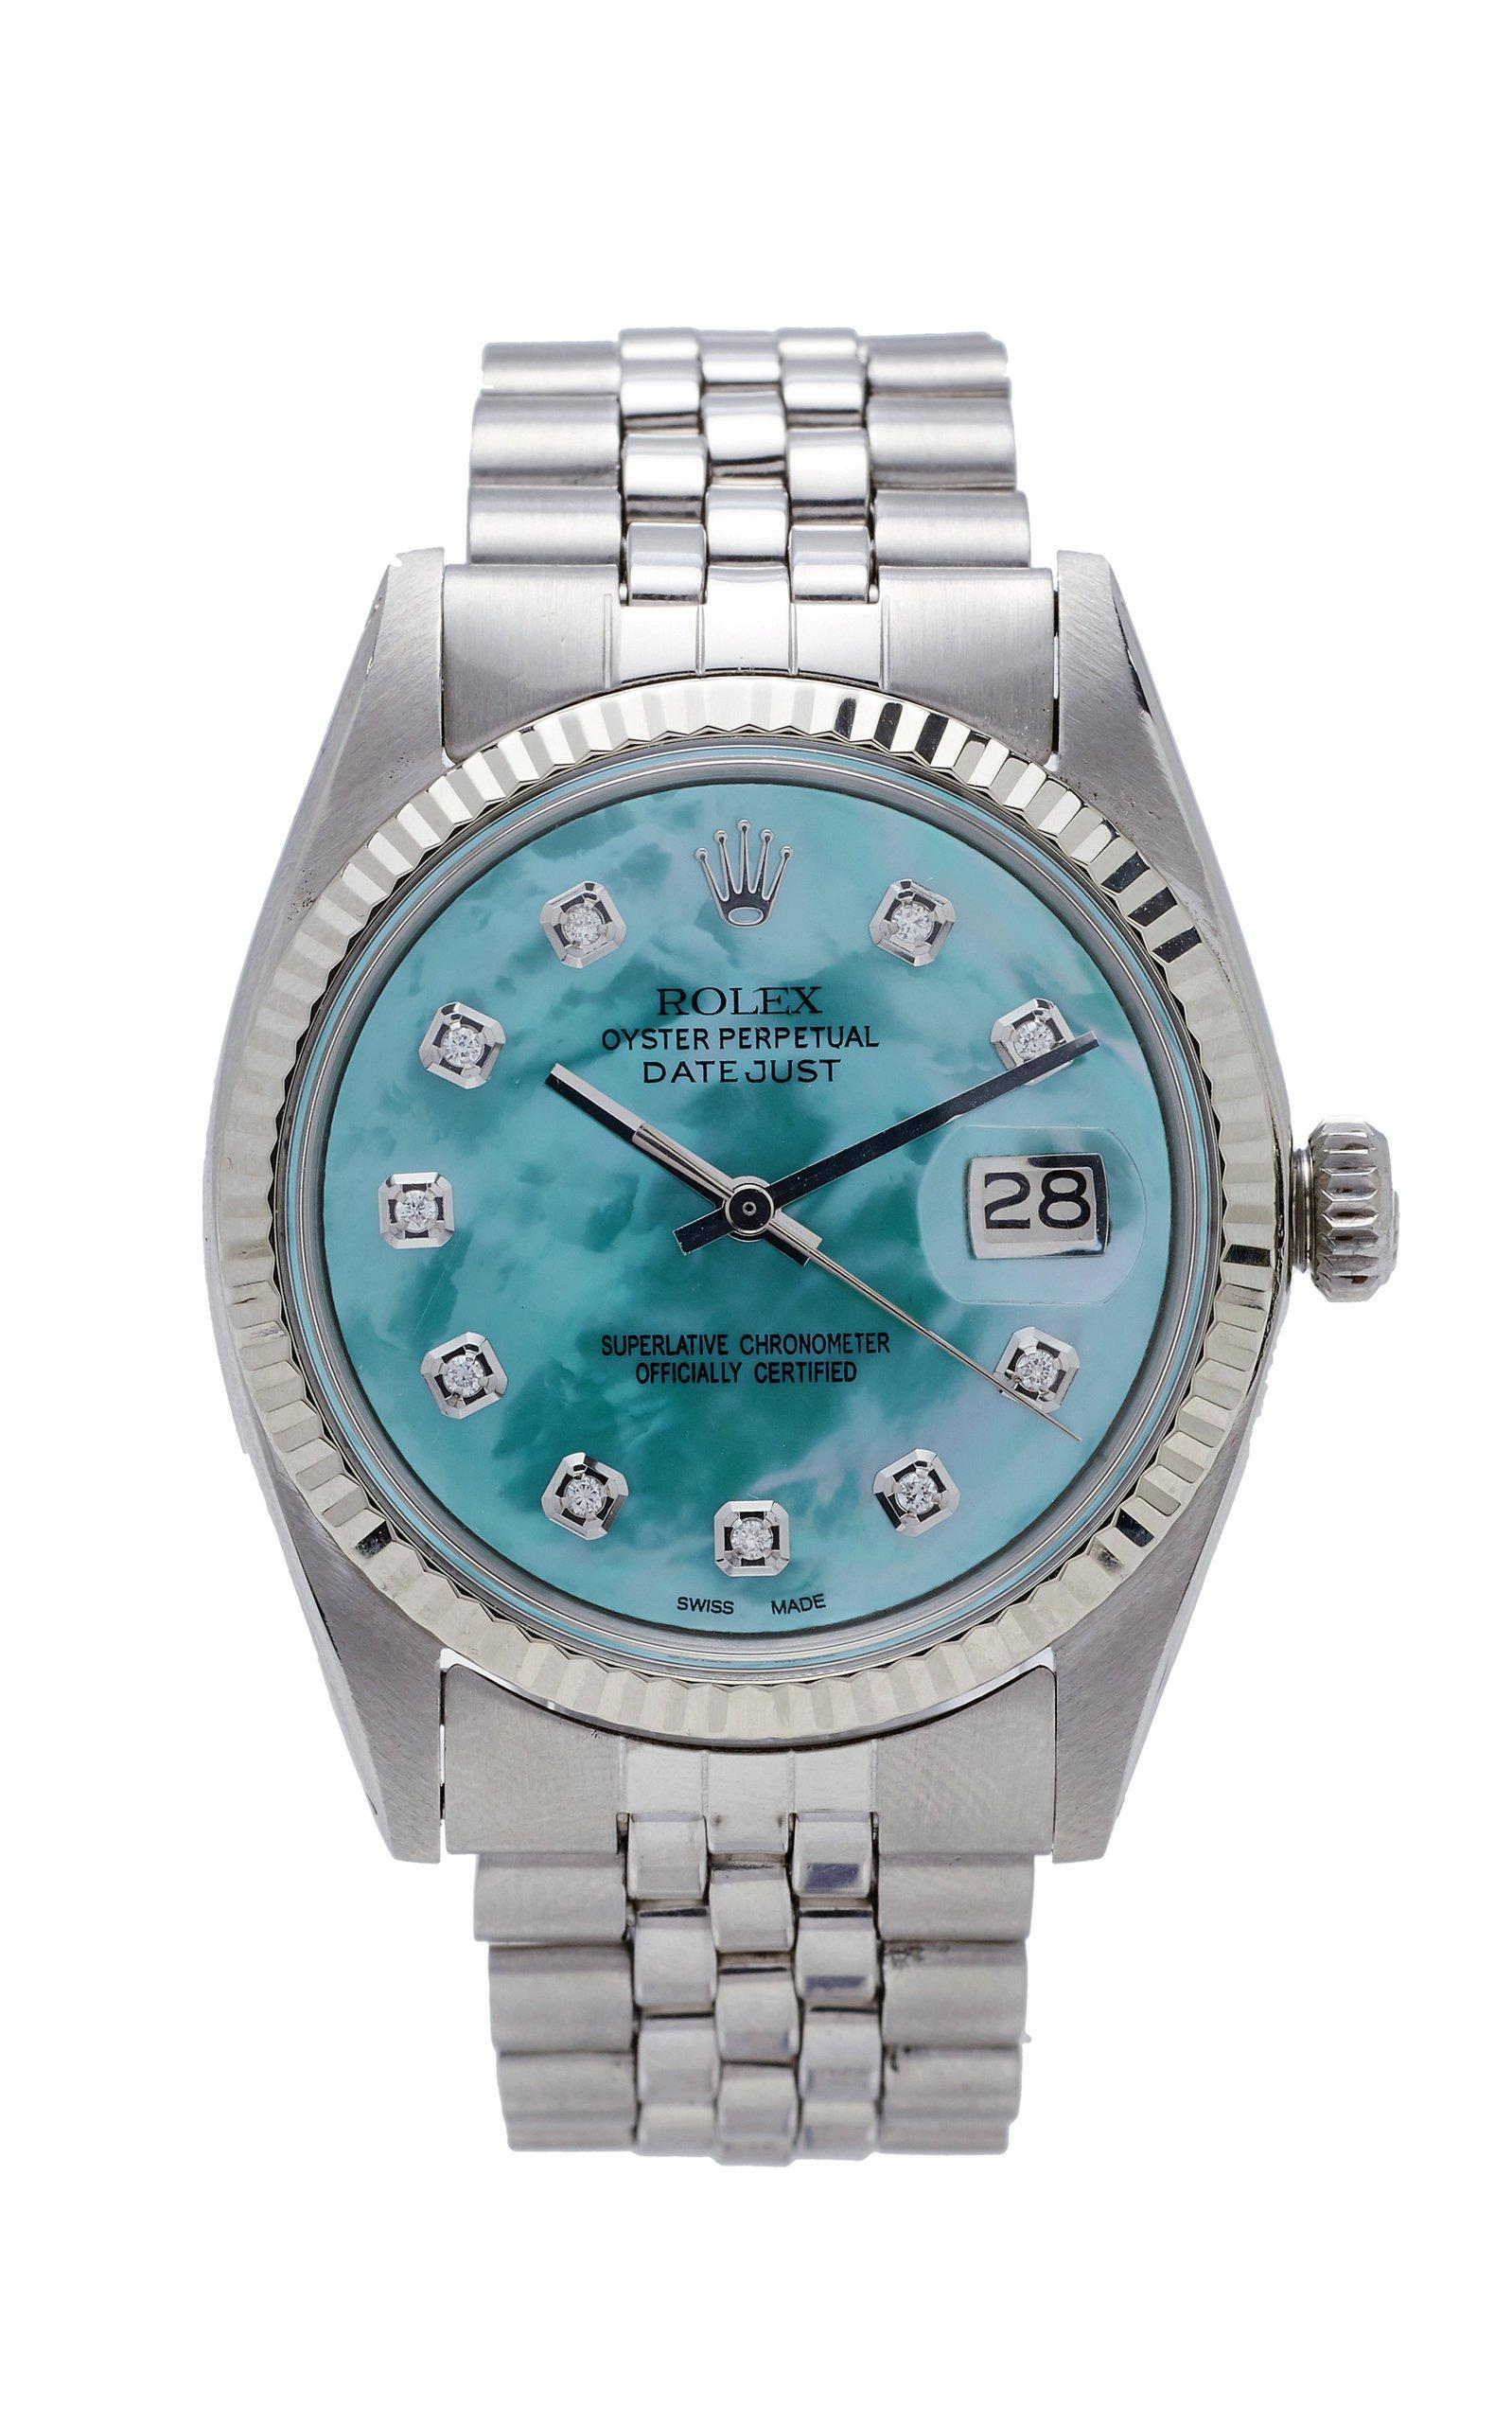 Vintage Watches Rolex Datejust 36mm Aqua Green Pearlized Diamond Dial